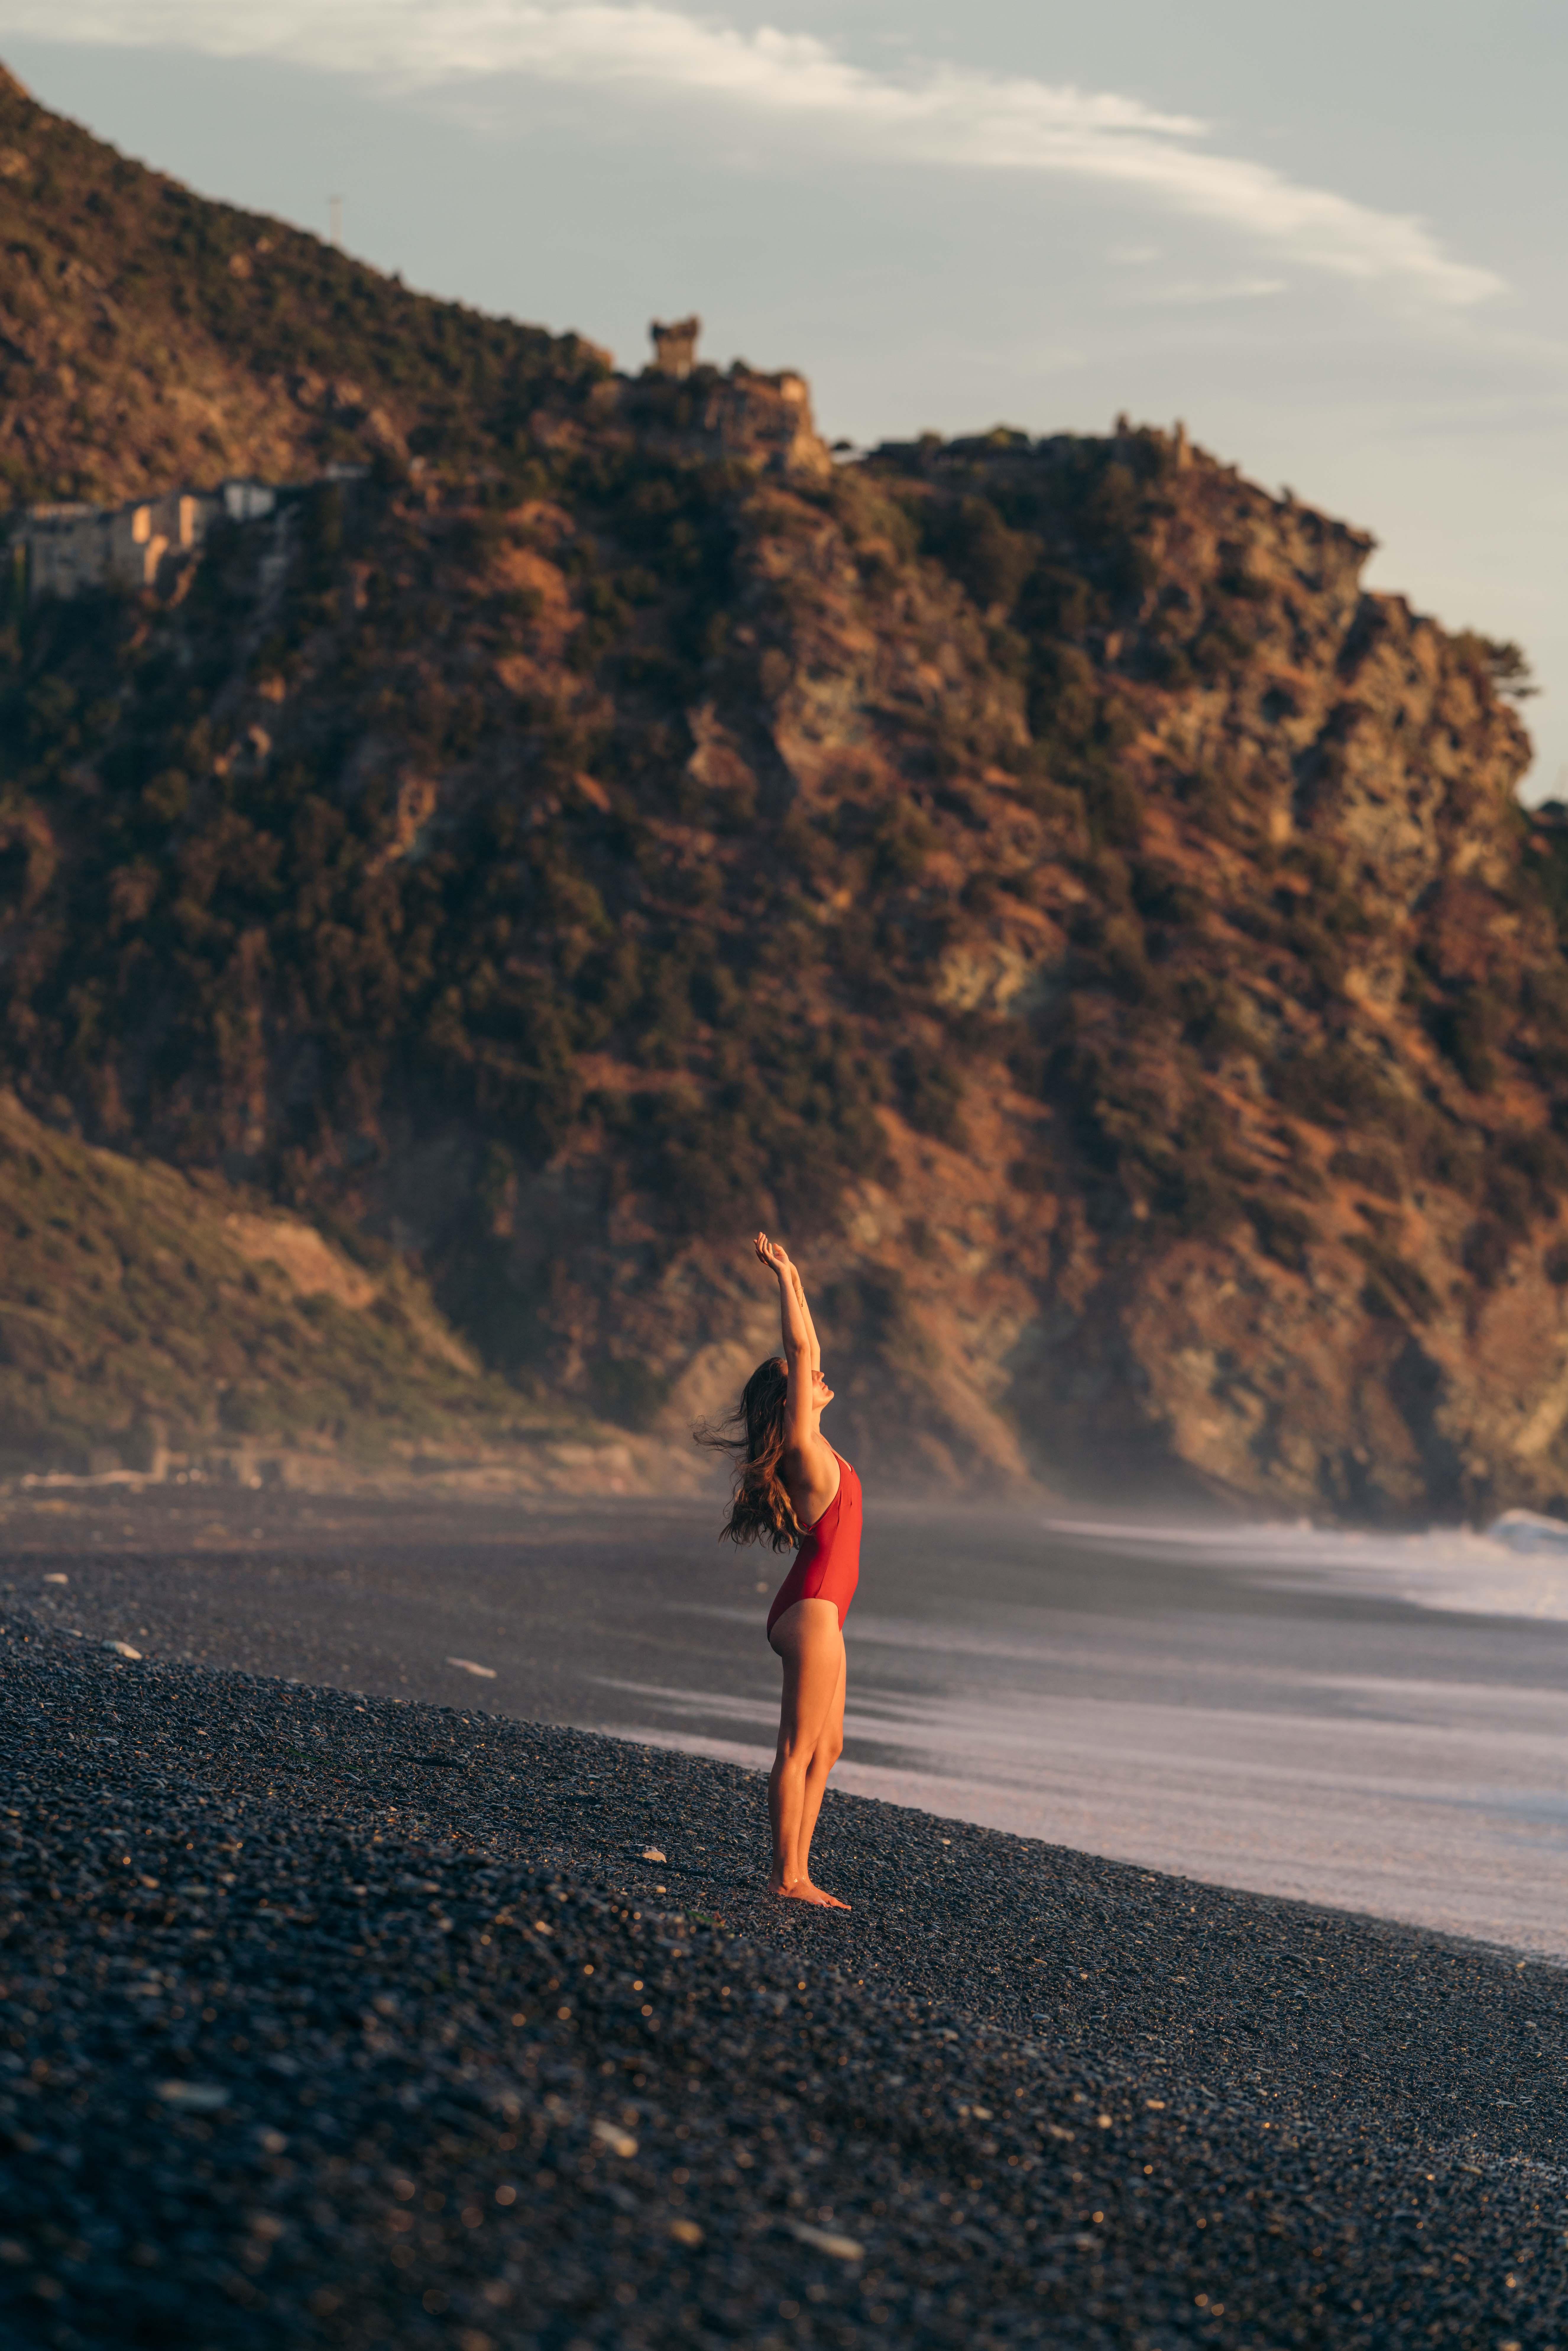 plage de nonza korsyka najlepsze plaże na korsyce